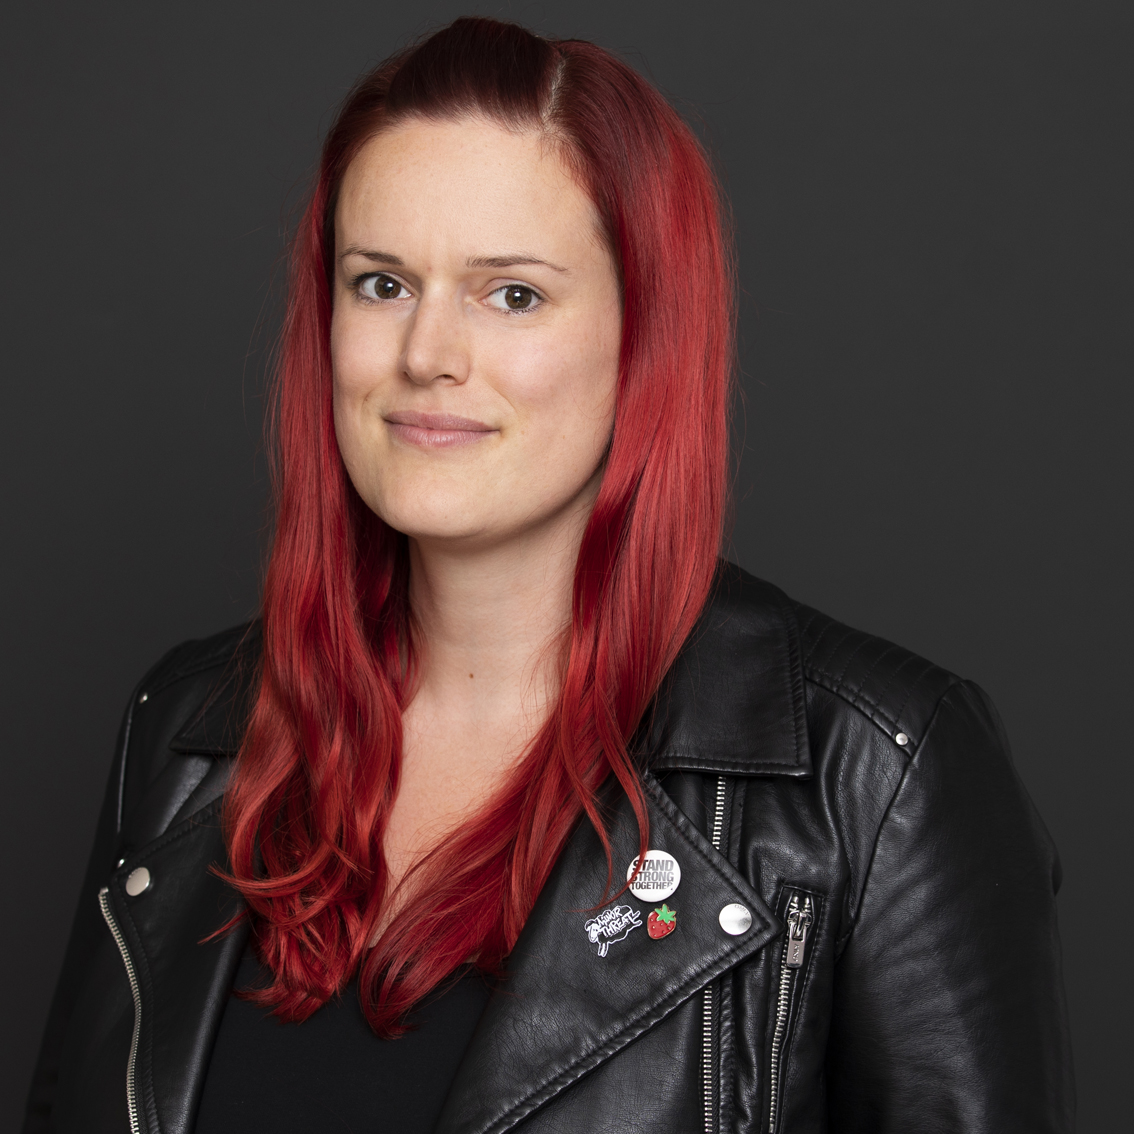 Susanne Lindlbauer